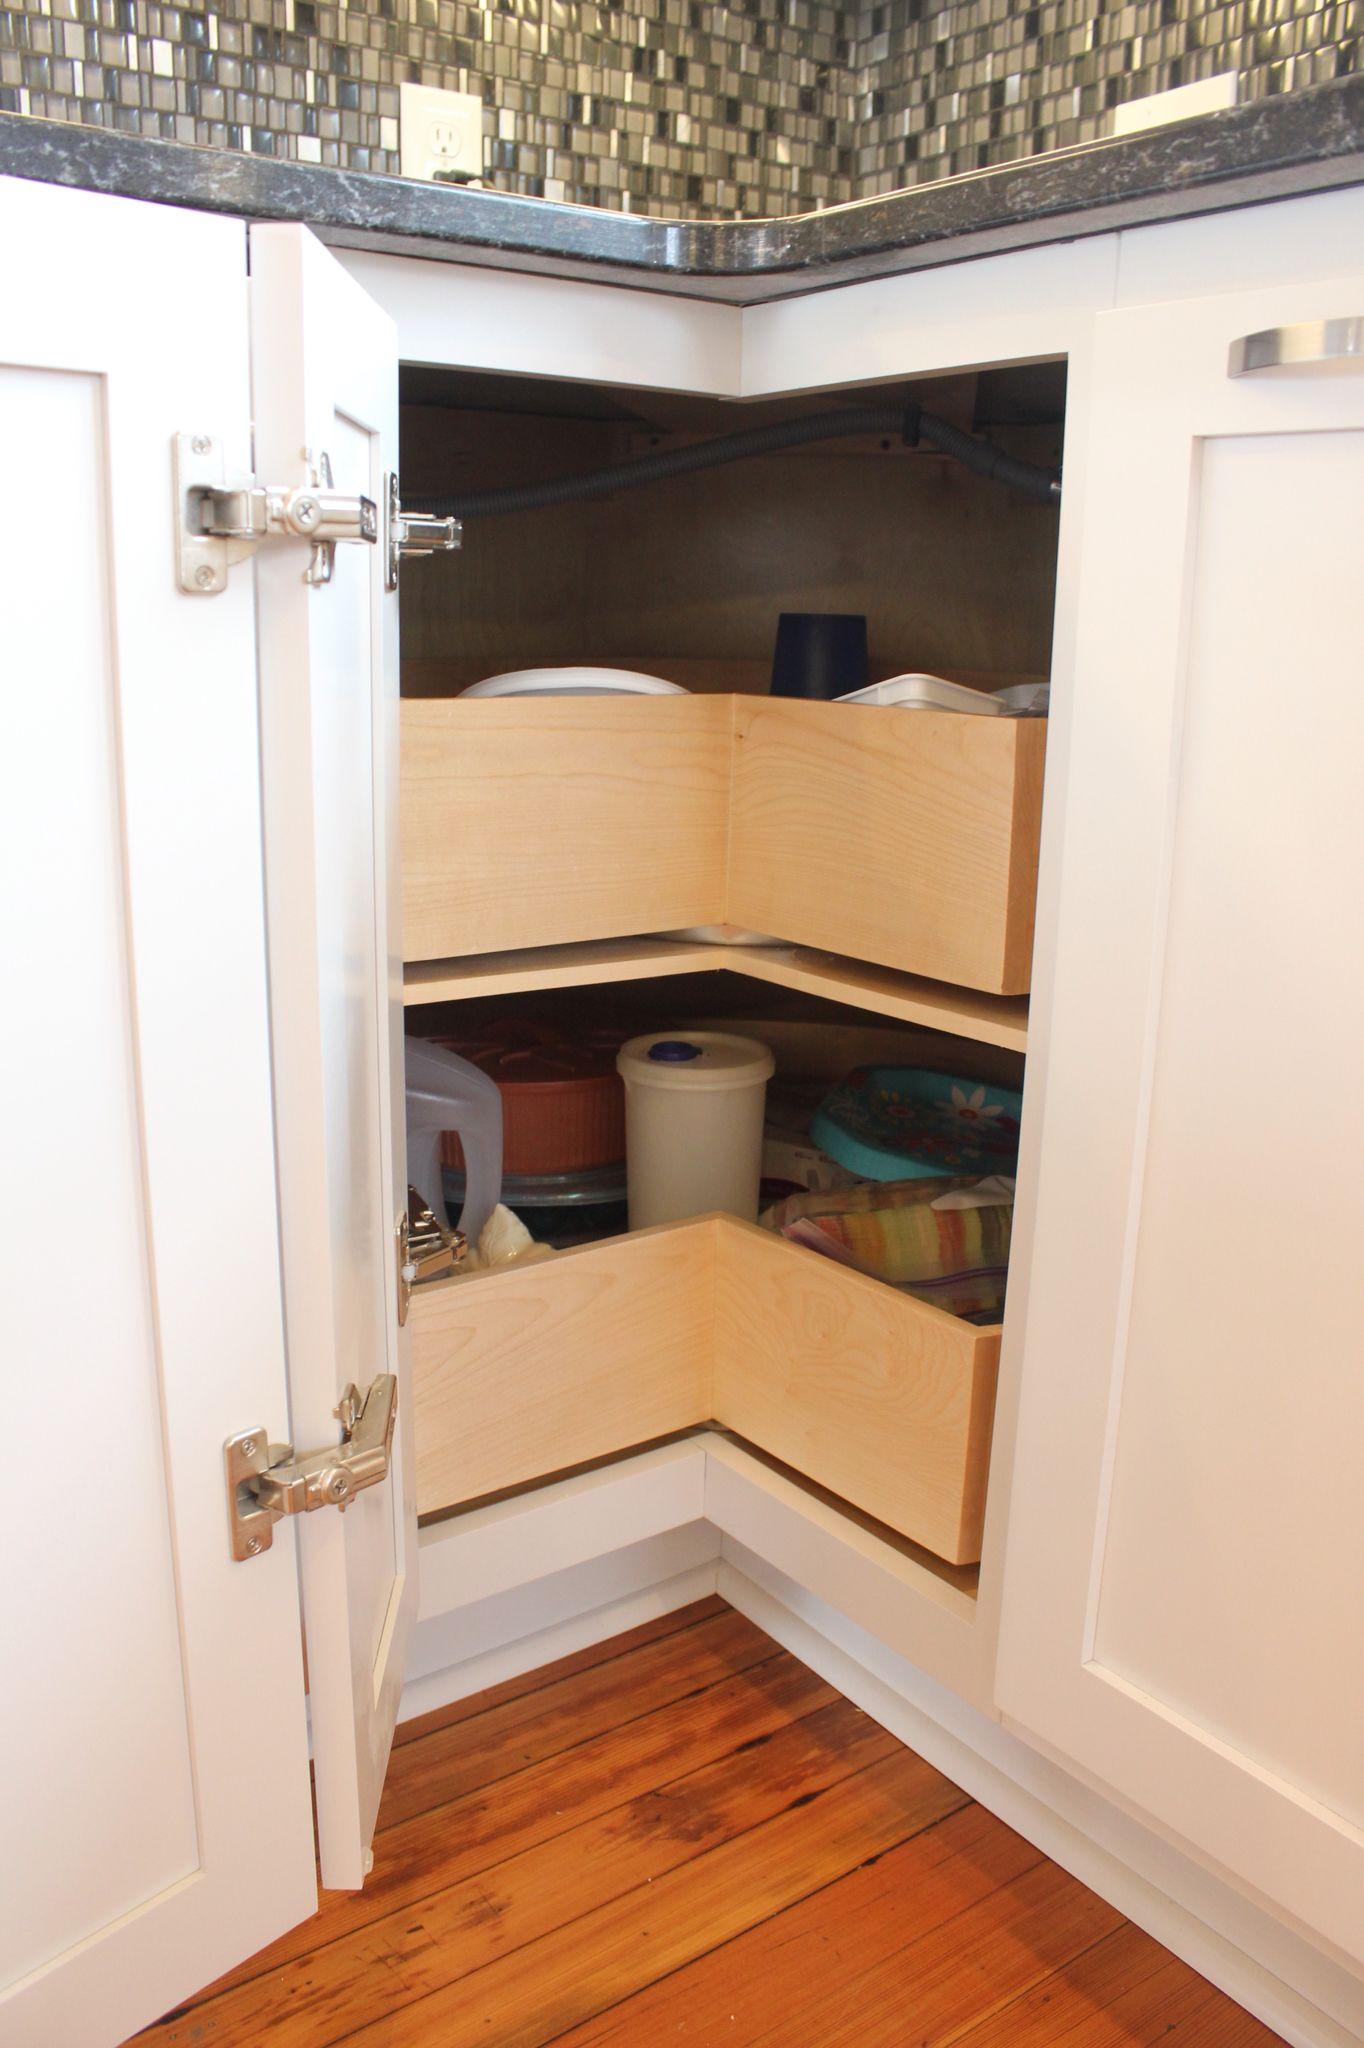 Lazy Susan kitchen cabinet | Cabinet, Kitchen cabinets